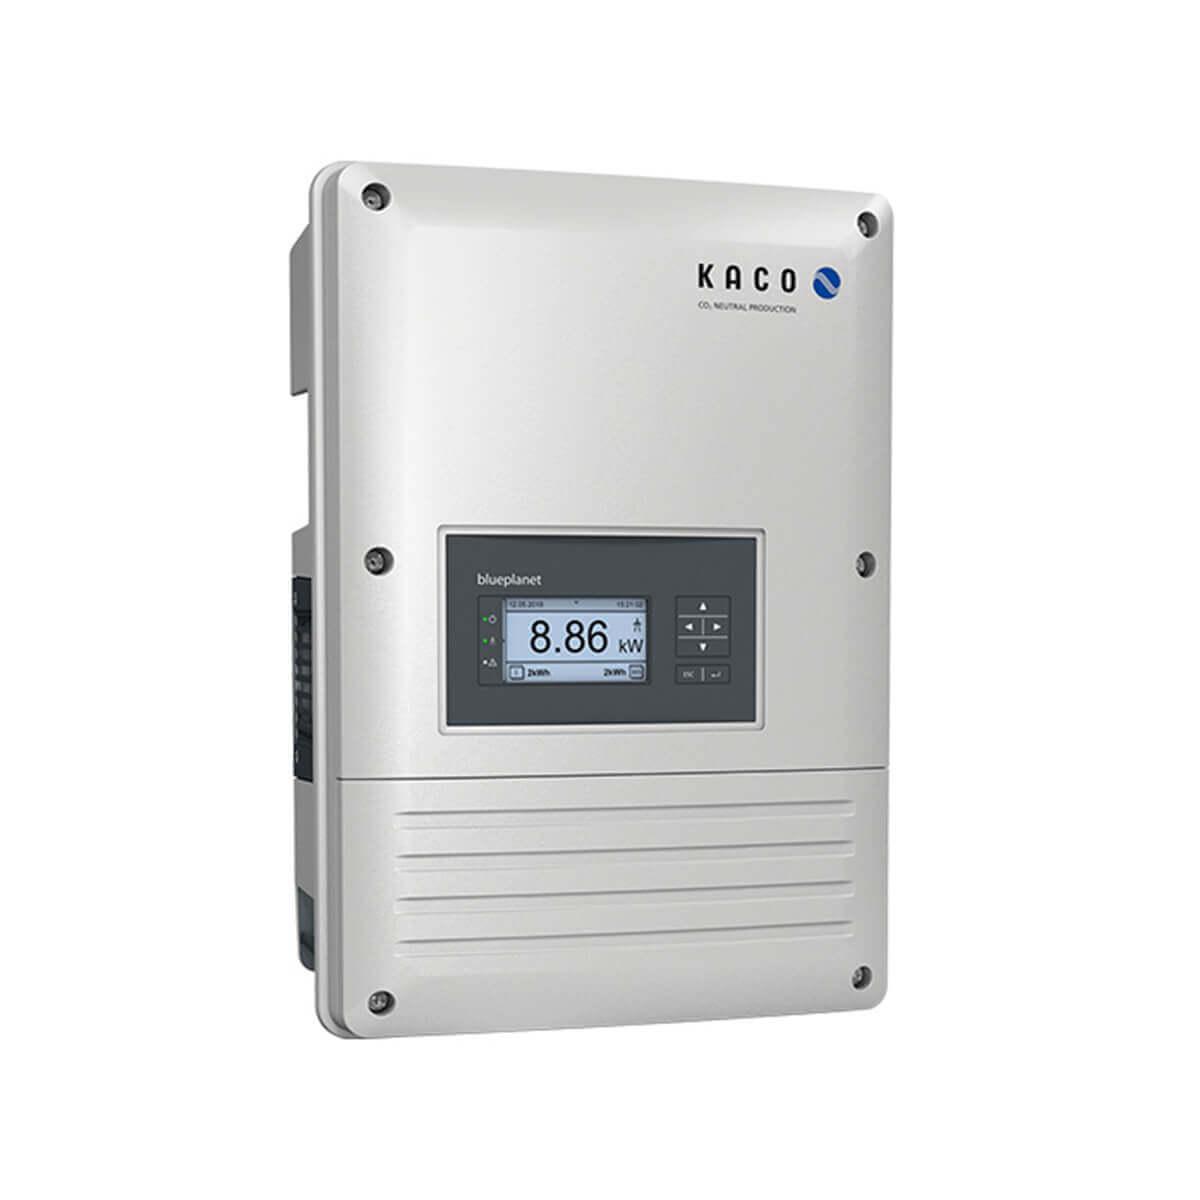 kaco 7.5kW inverter, kaco blueplanet 7.5kW inverter, kaco blueplanet 7.5tl3 inverter, kaco blueplanet 7.5tl3, kaco blueplanet 7.5 kW, KACO 7.5 KW